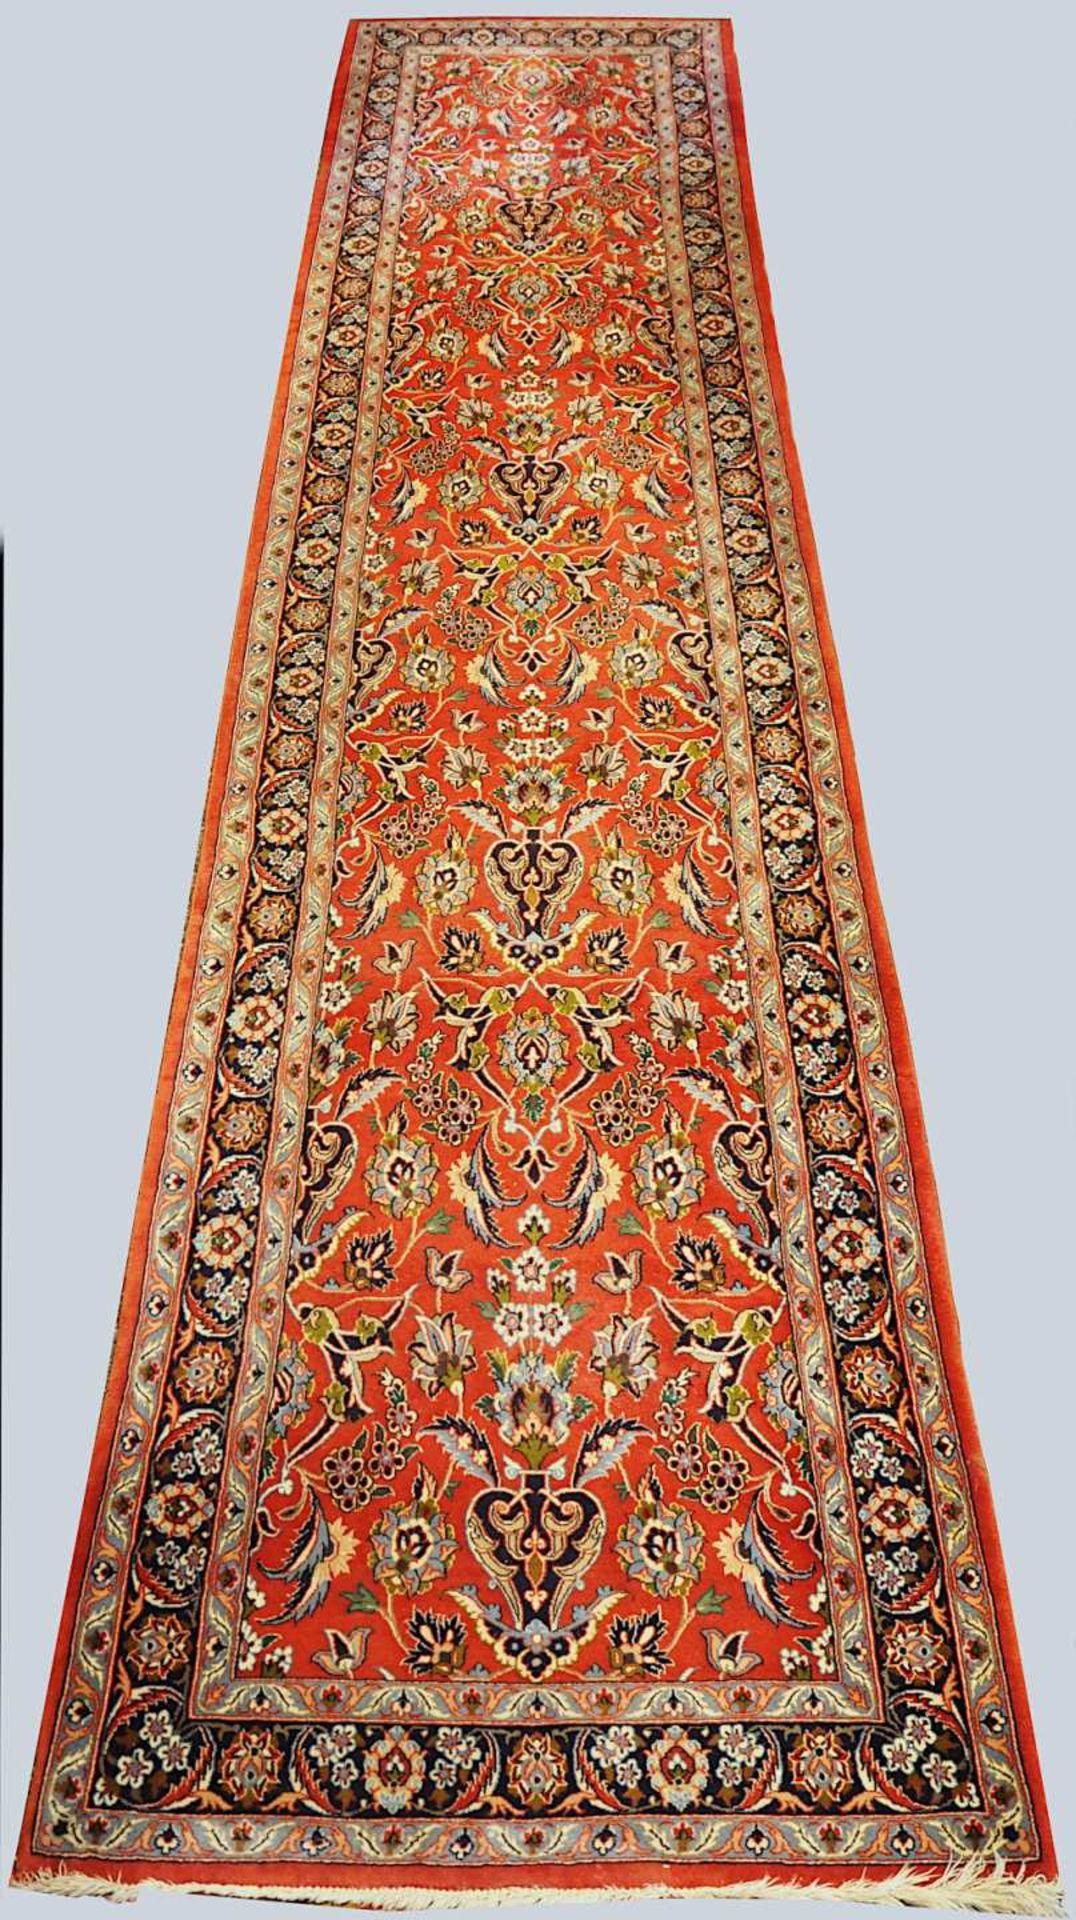 2 Orientgalerien 20. Jh., z.T. mit Seidenanteil je rotgrundig mit floralem Dekor, je F - Bild 2 aus 3